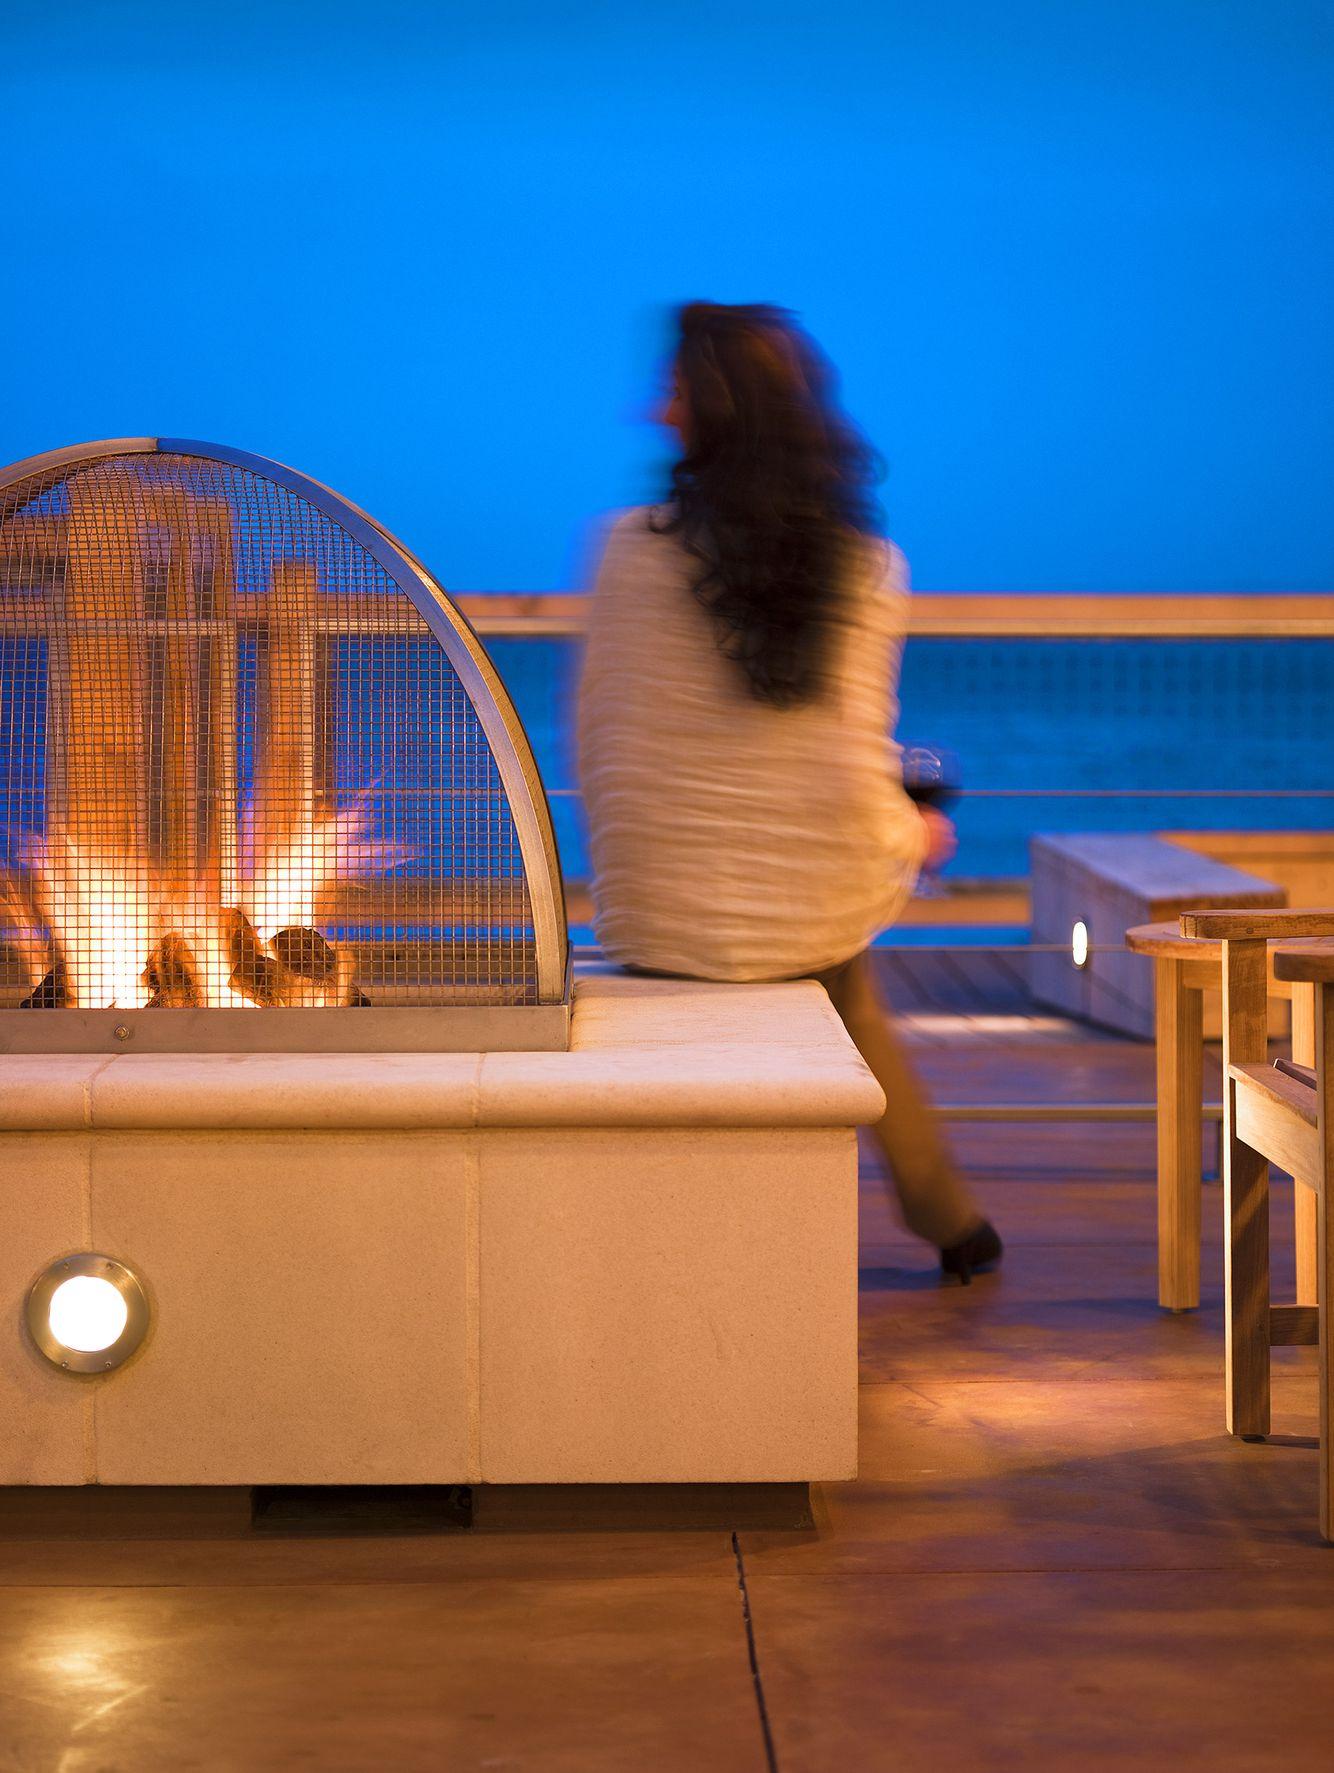 John-Sutton-Photography-InterContinental Hotel Monterey Bay Firepit